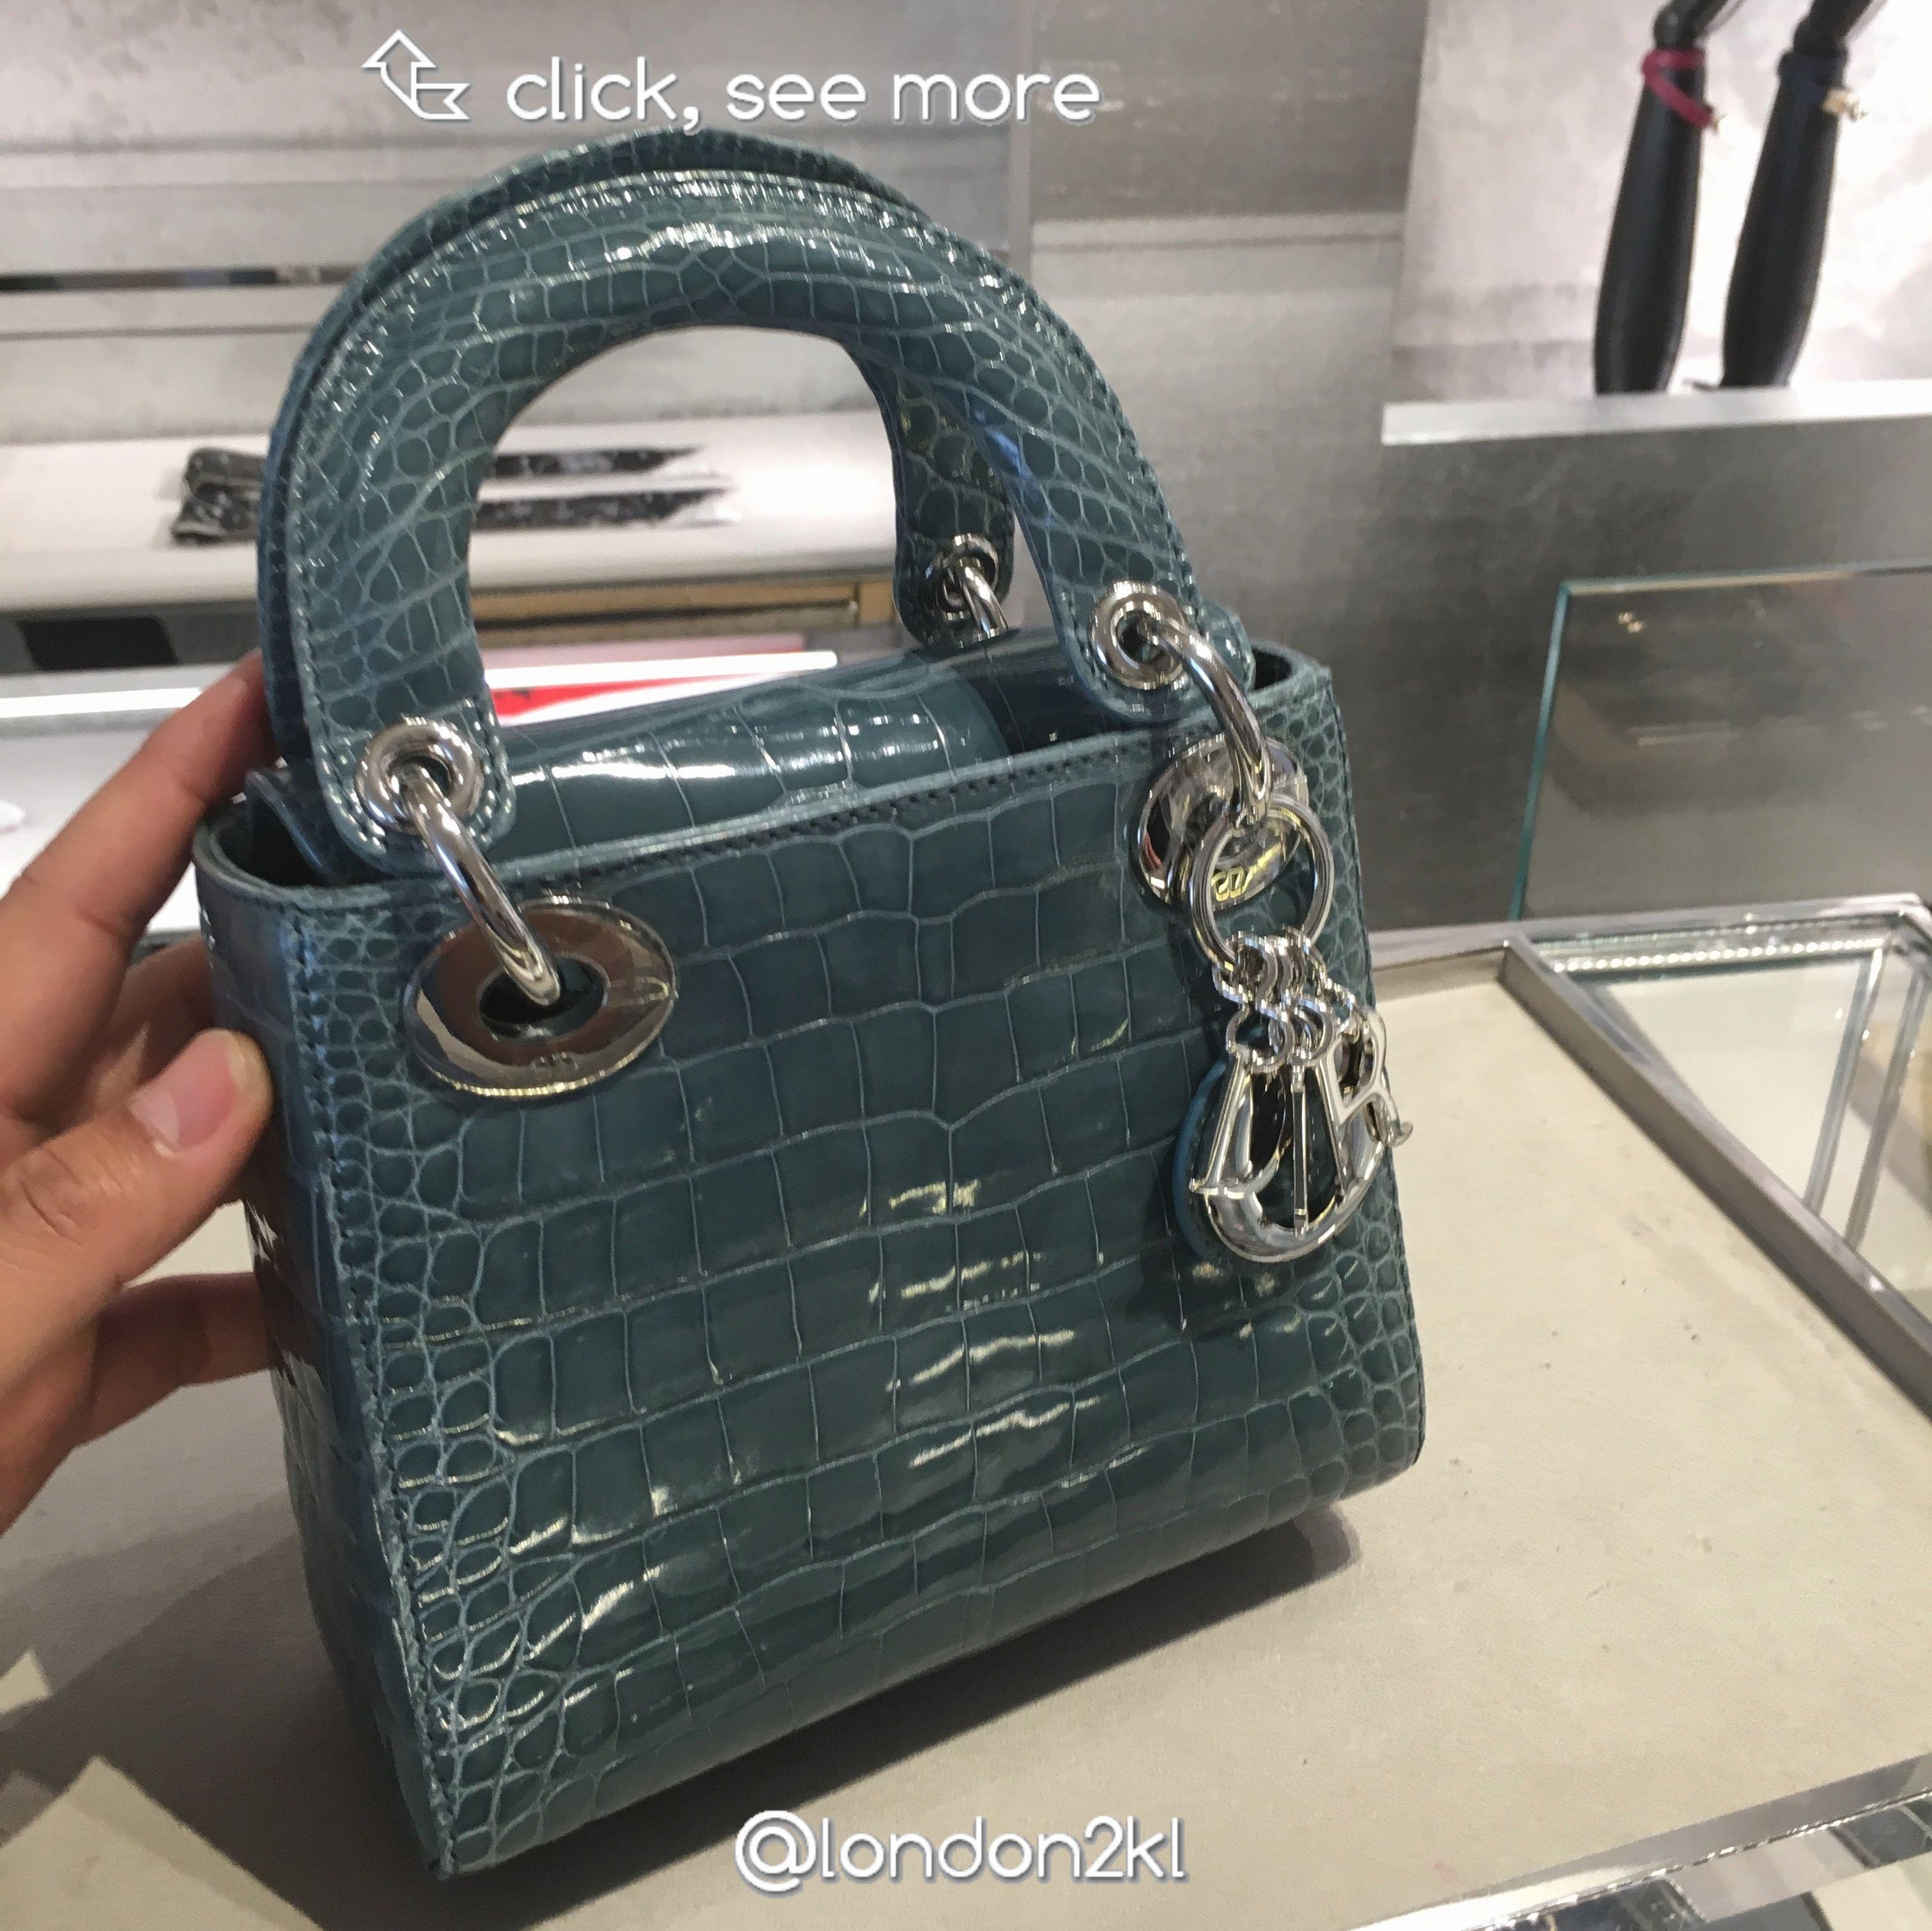 ad8f6fb11cb4a Mini Lady Dior Bag in Beautiful Croc